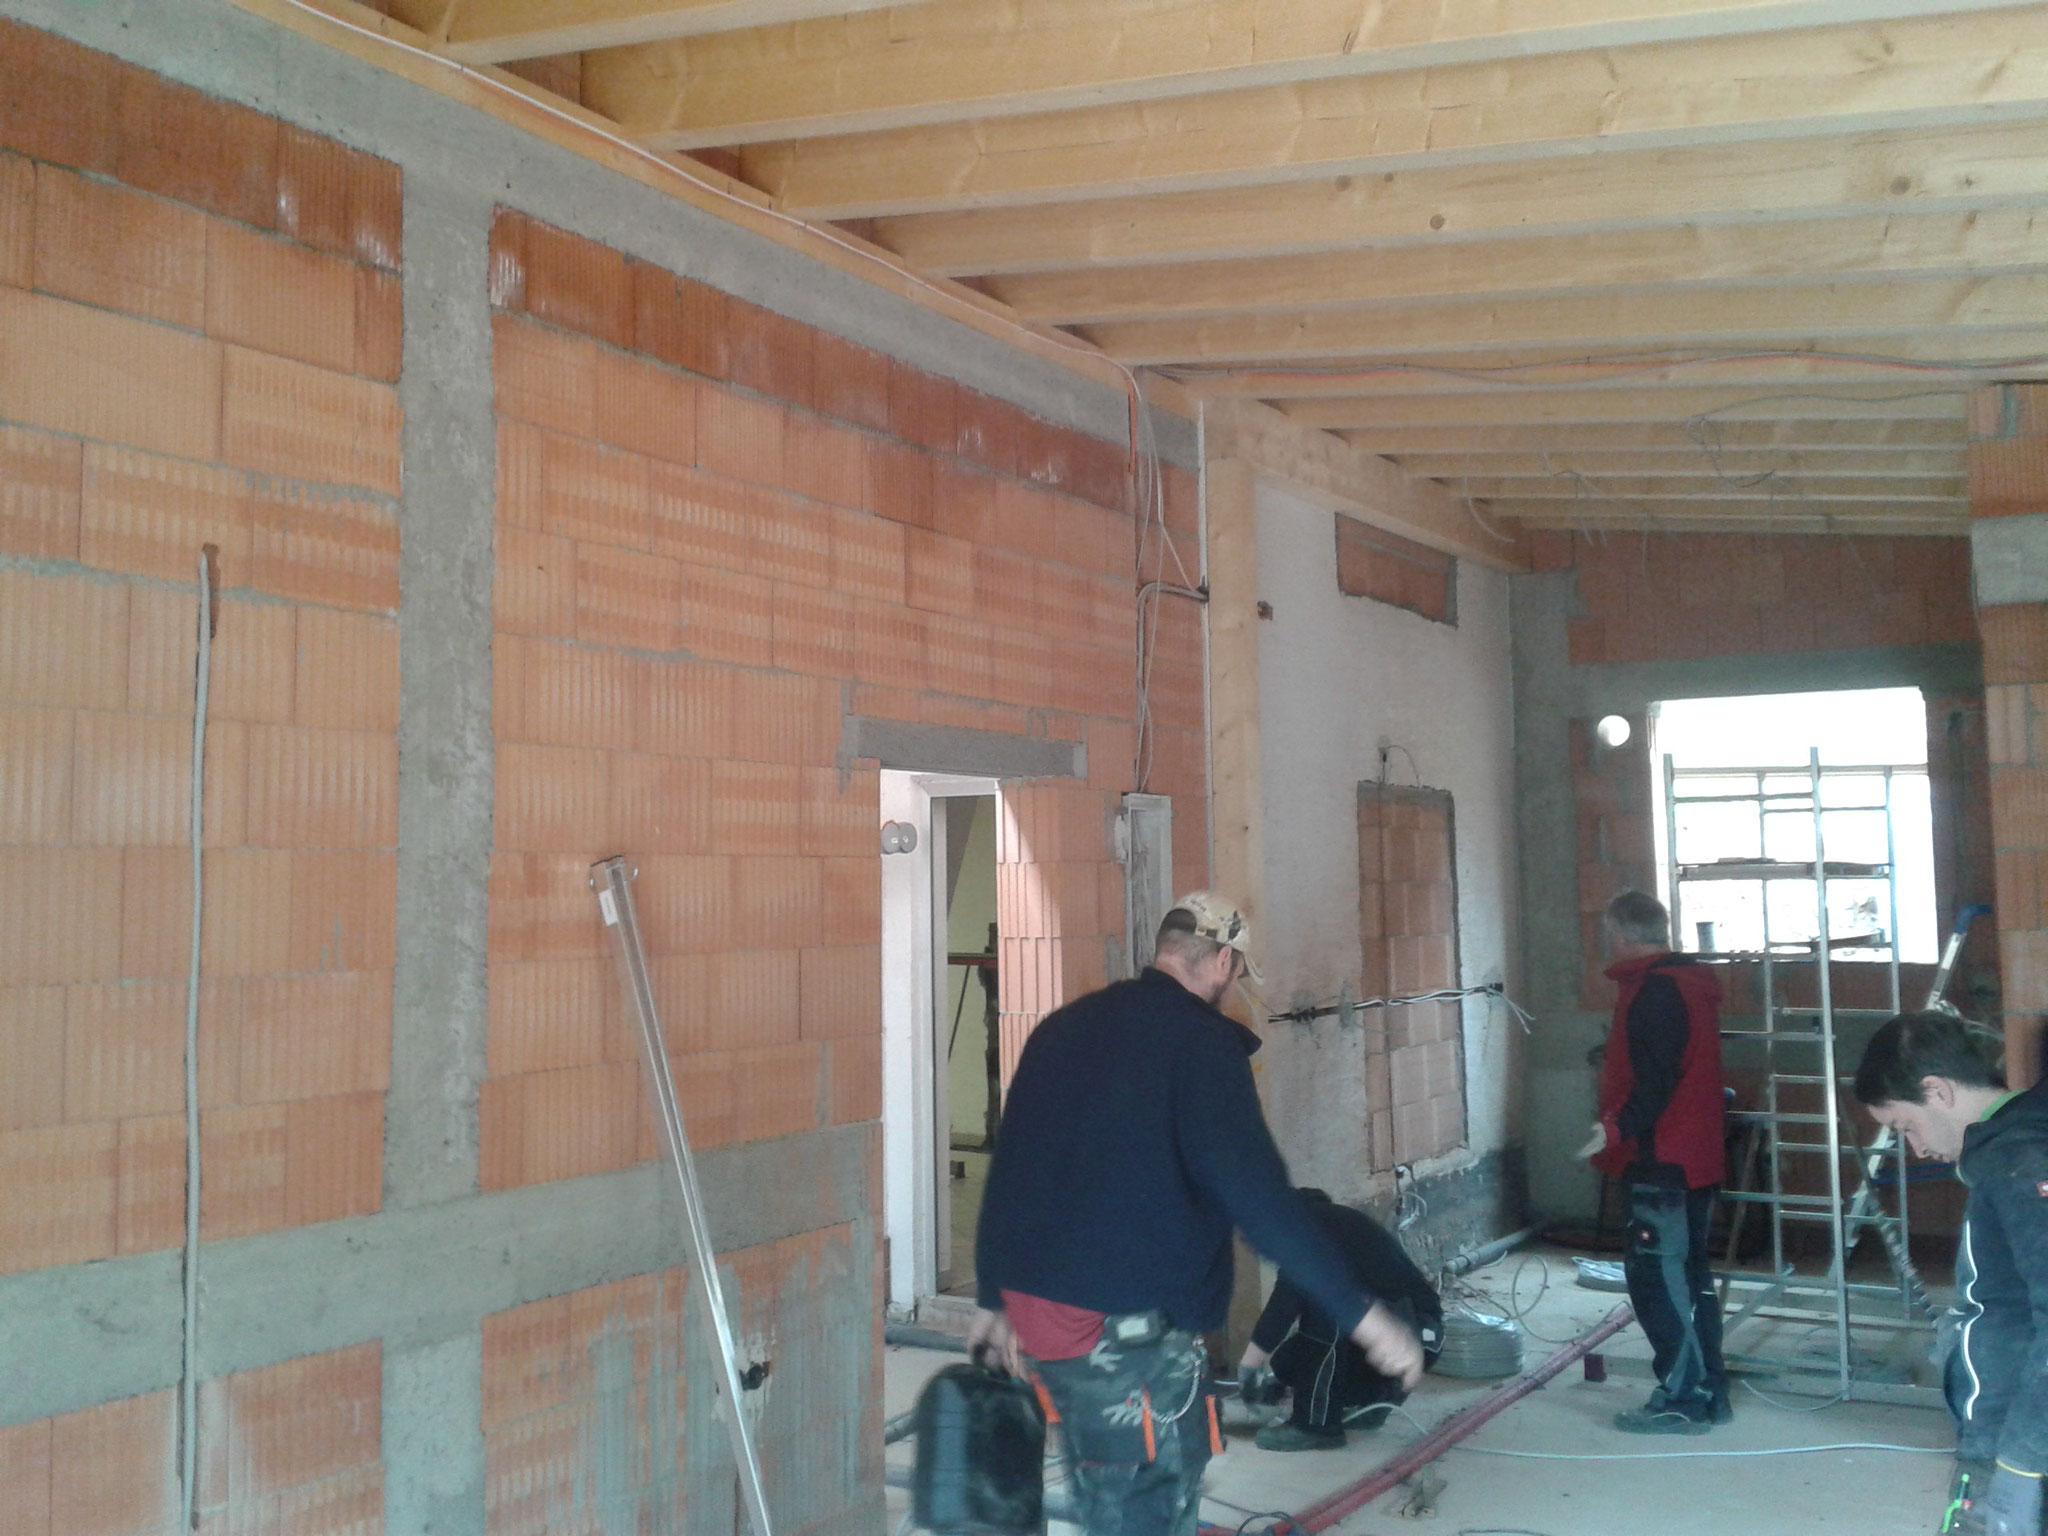 Baustellenbetrieb im Neubau.